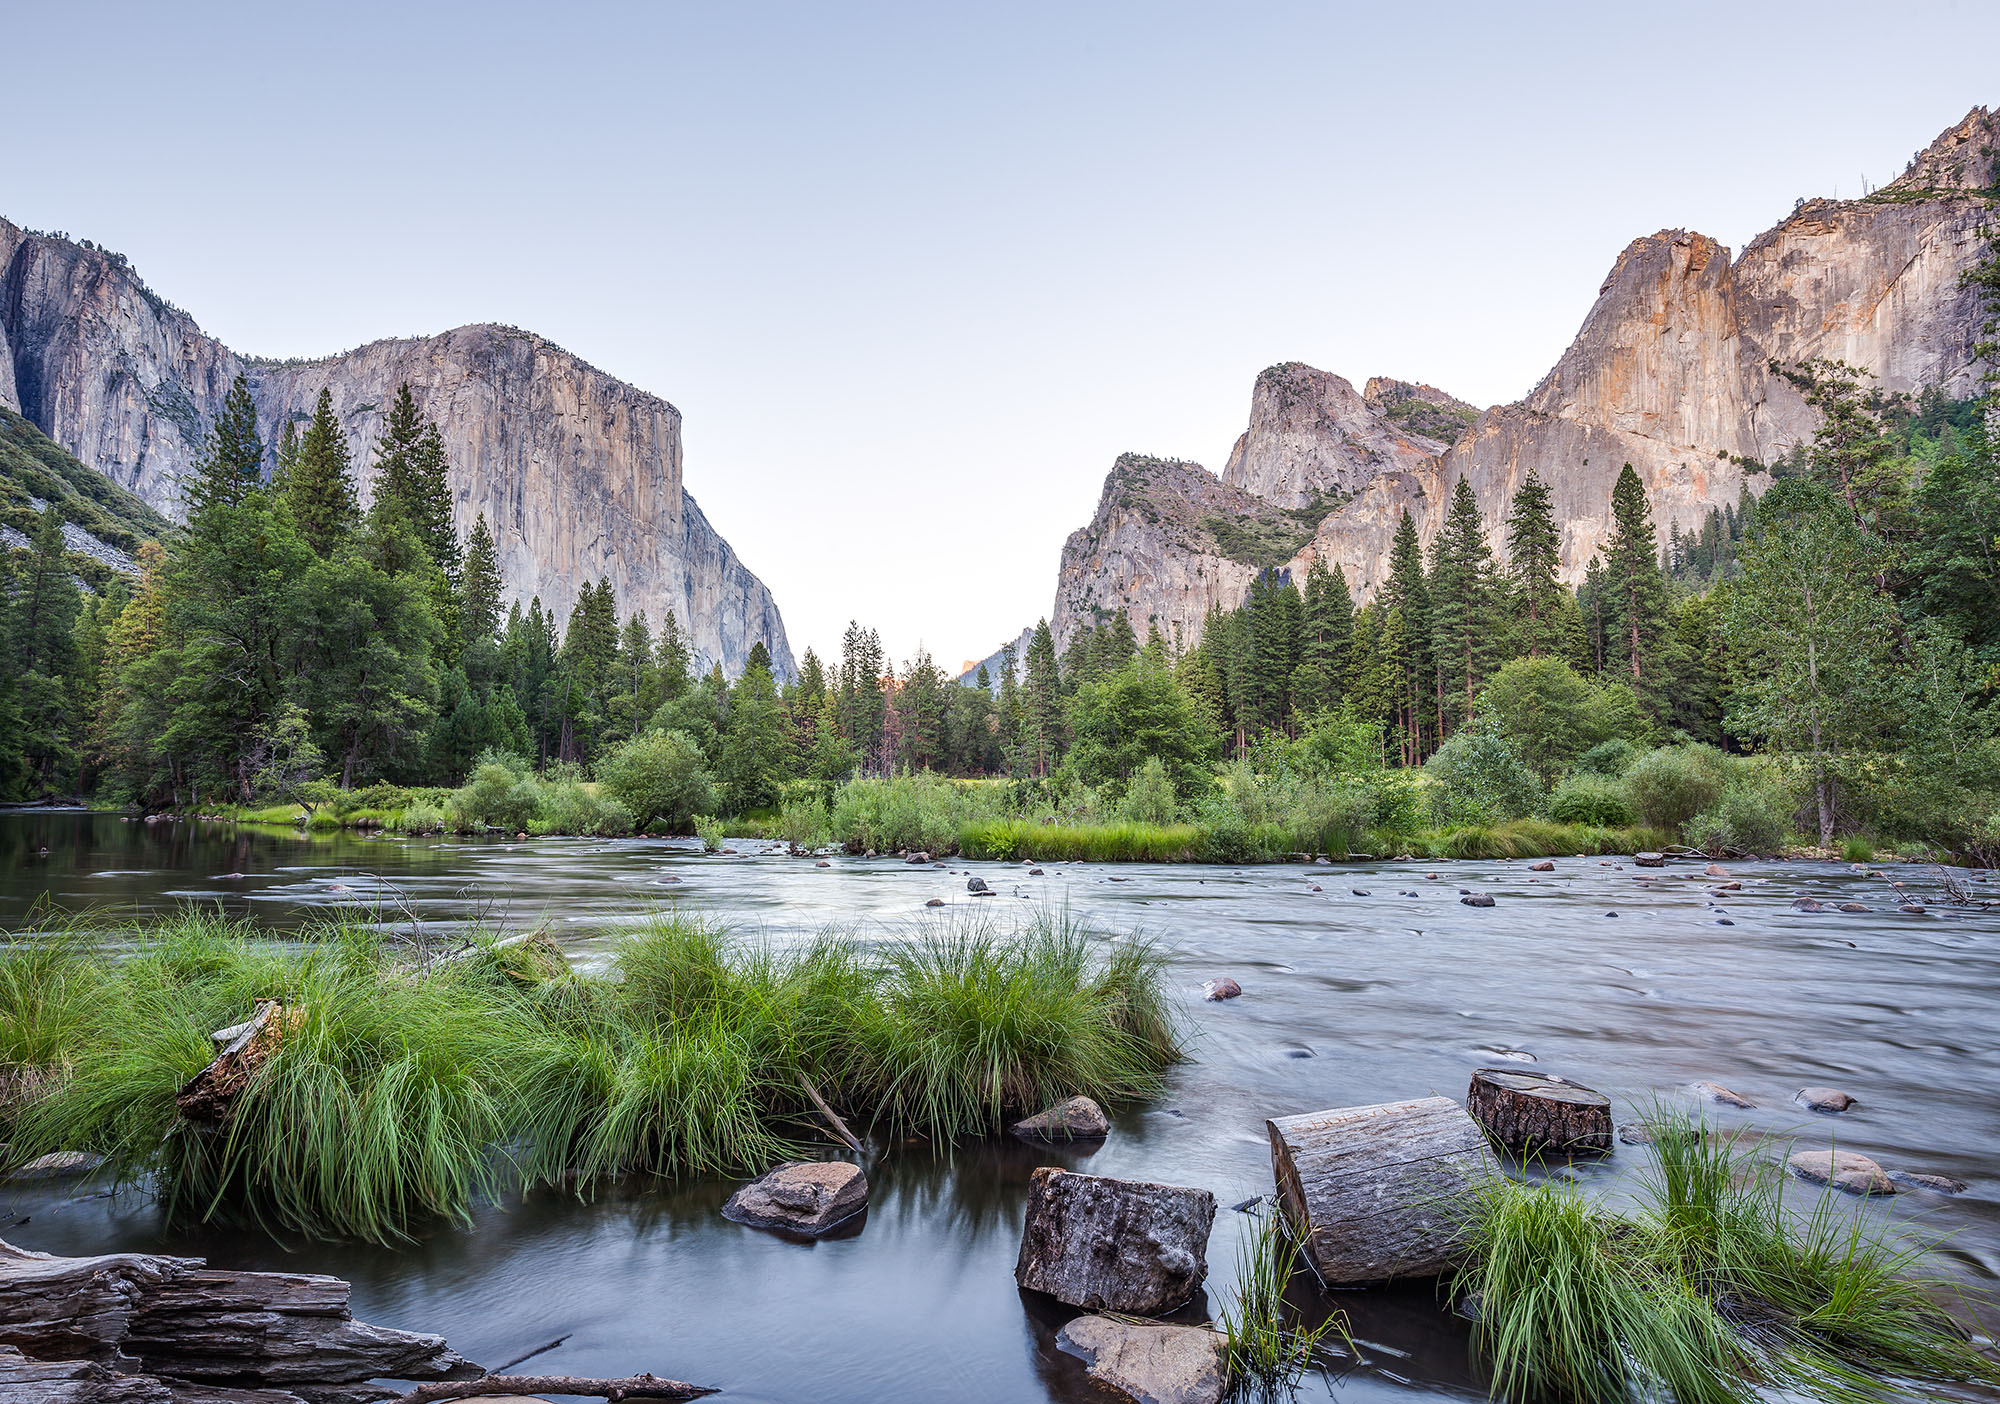 Classic view of Yosemite Valley at sunset in Yosemite National Park, California, USA